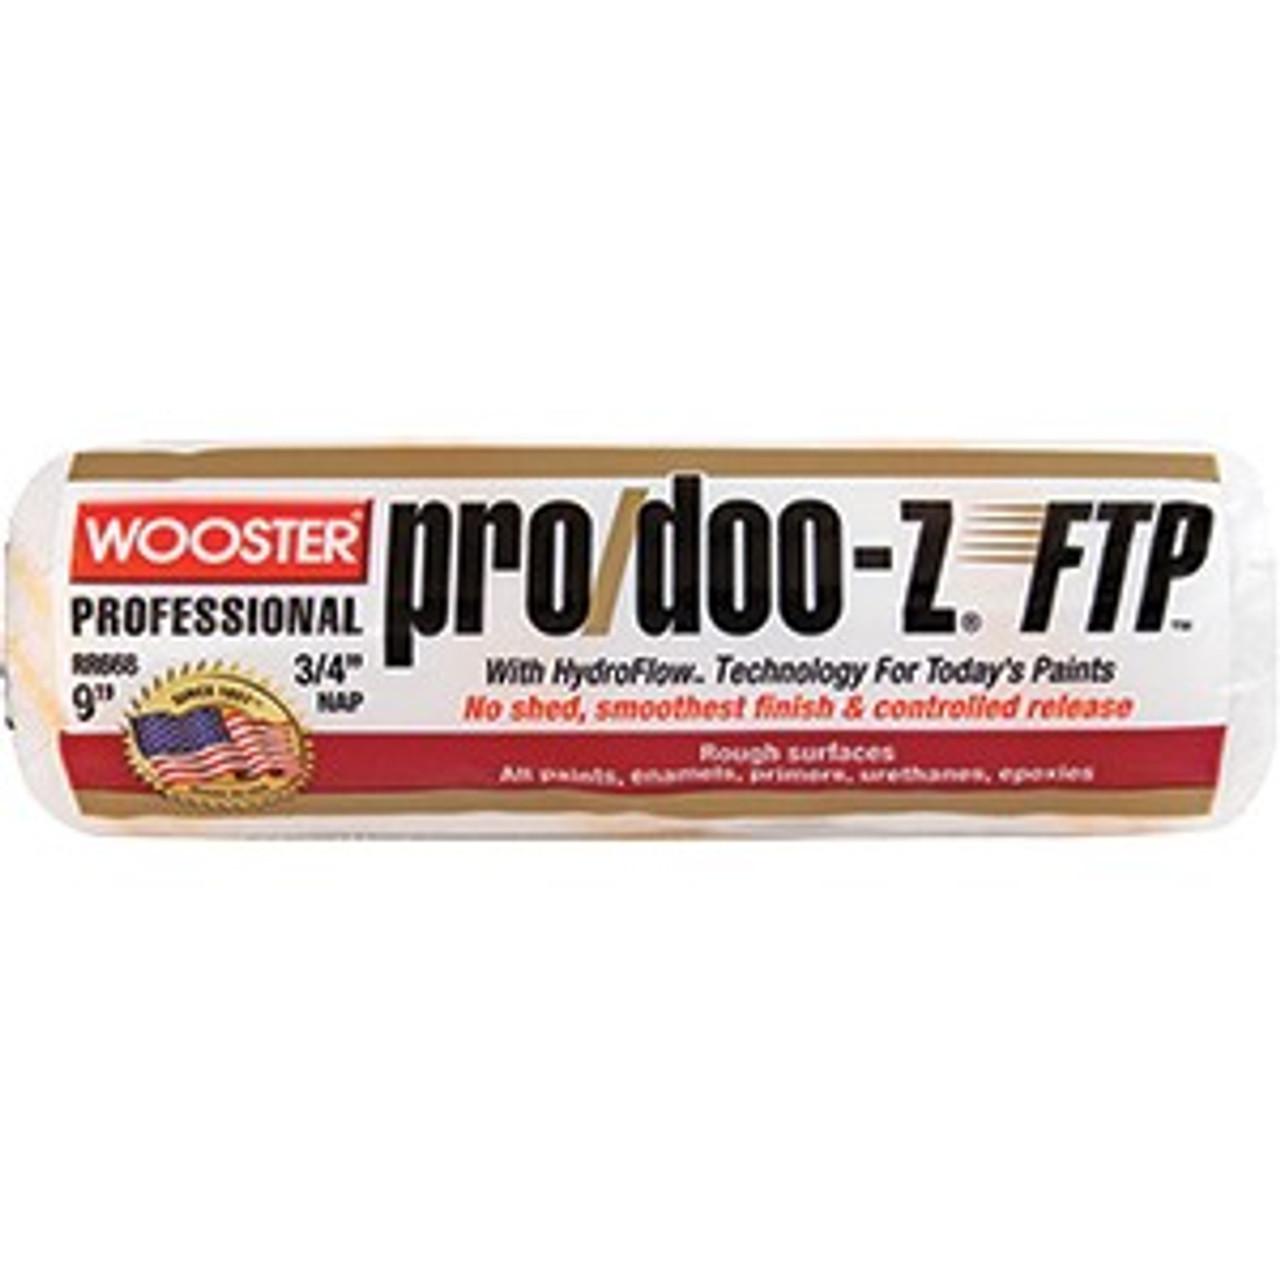 "Wooster RR668 9"" Pro/Doo-Z FTP 3/4"" Nap Roller Cover"